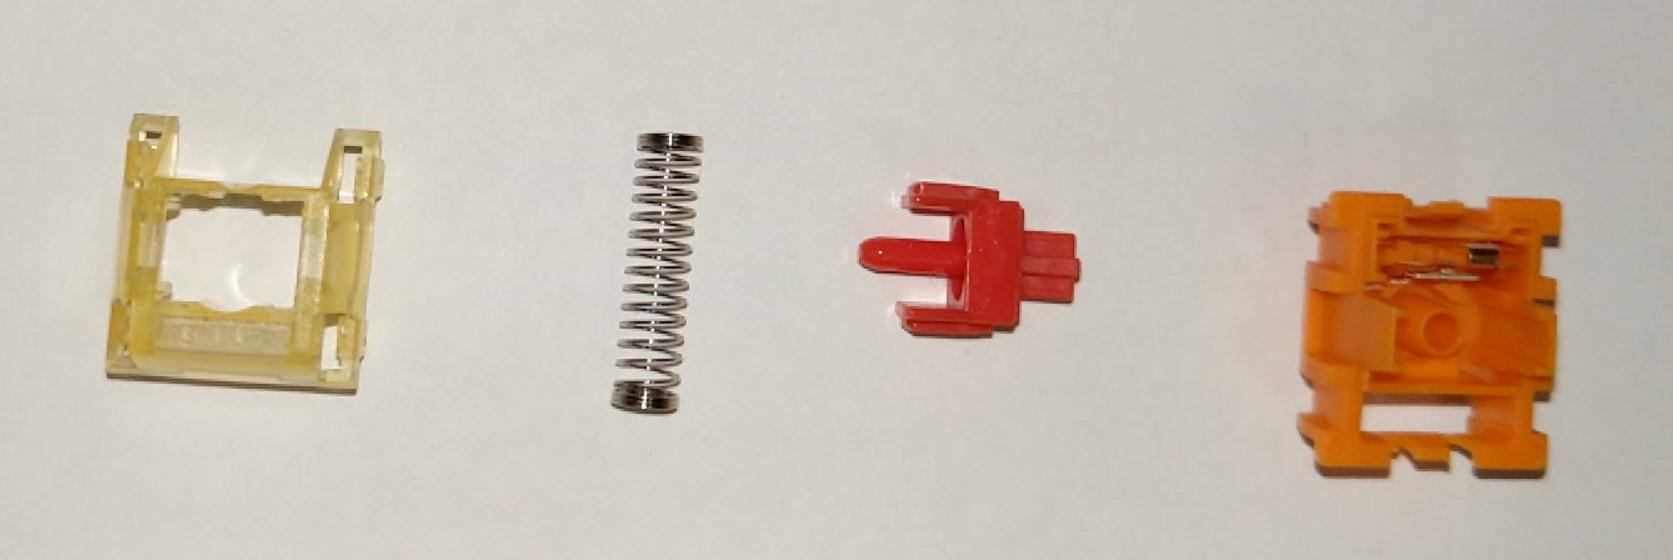 TTC Gold V2 switches disassembled